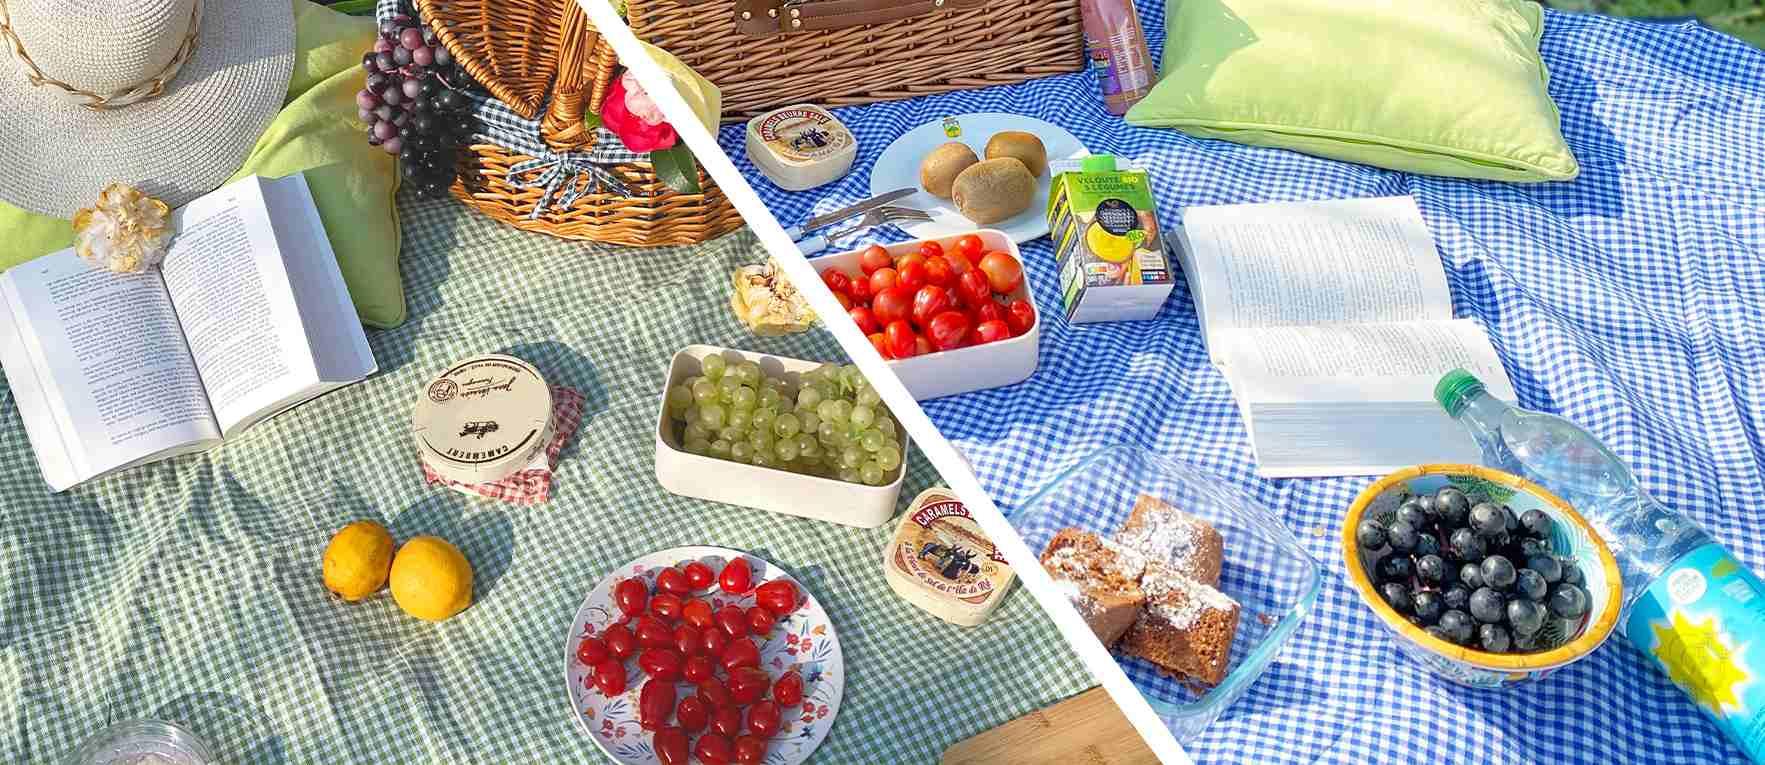 telo da picnic impermeabile blu e verde gingham